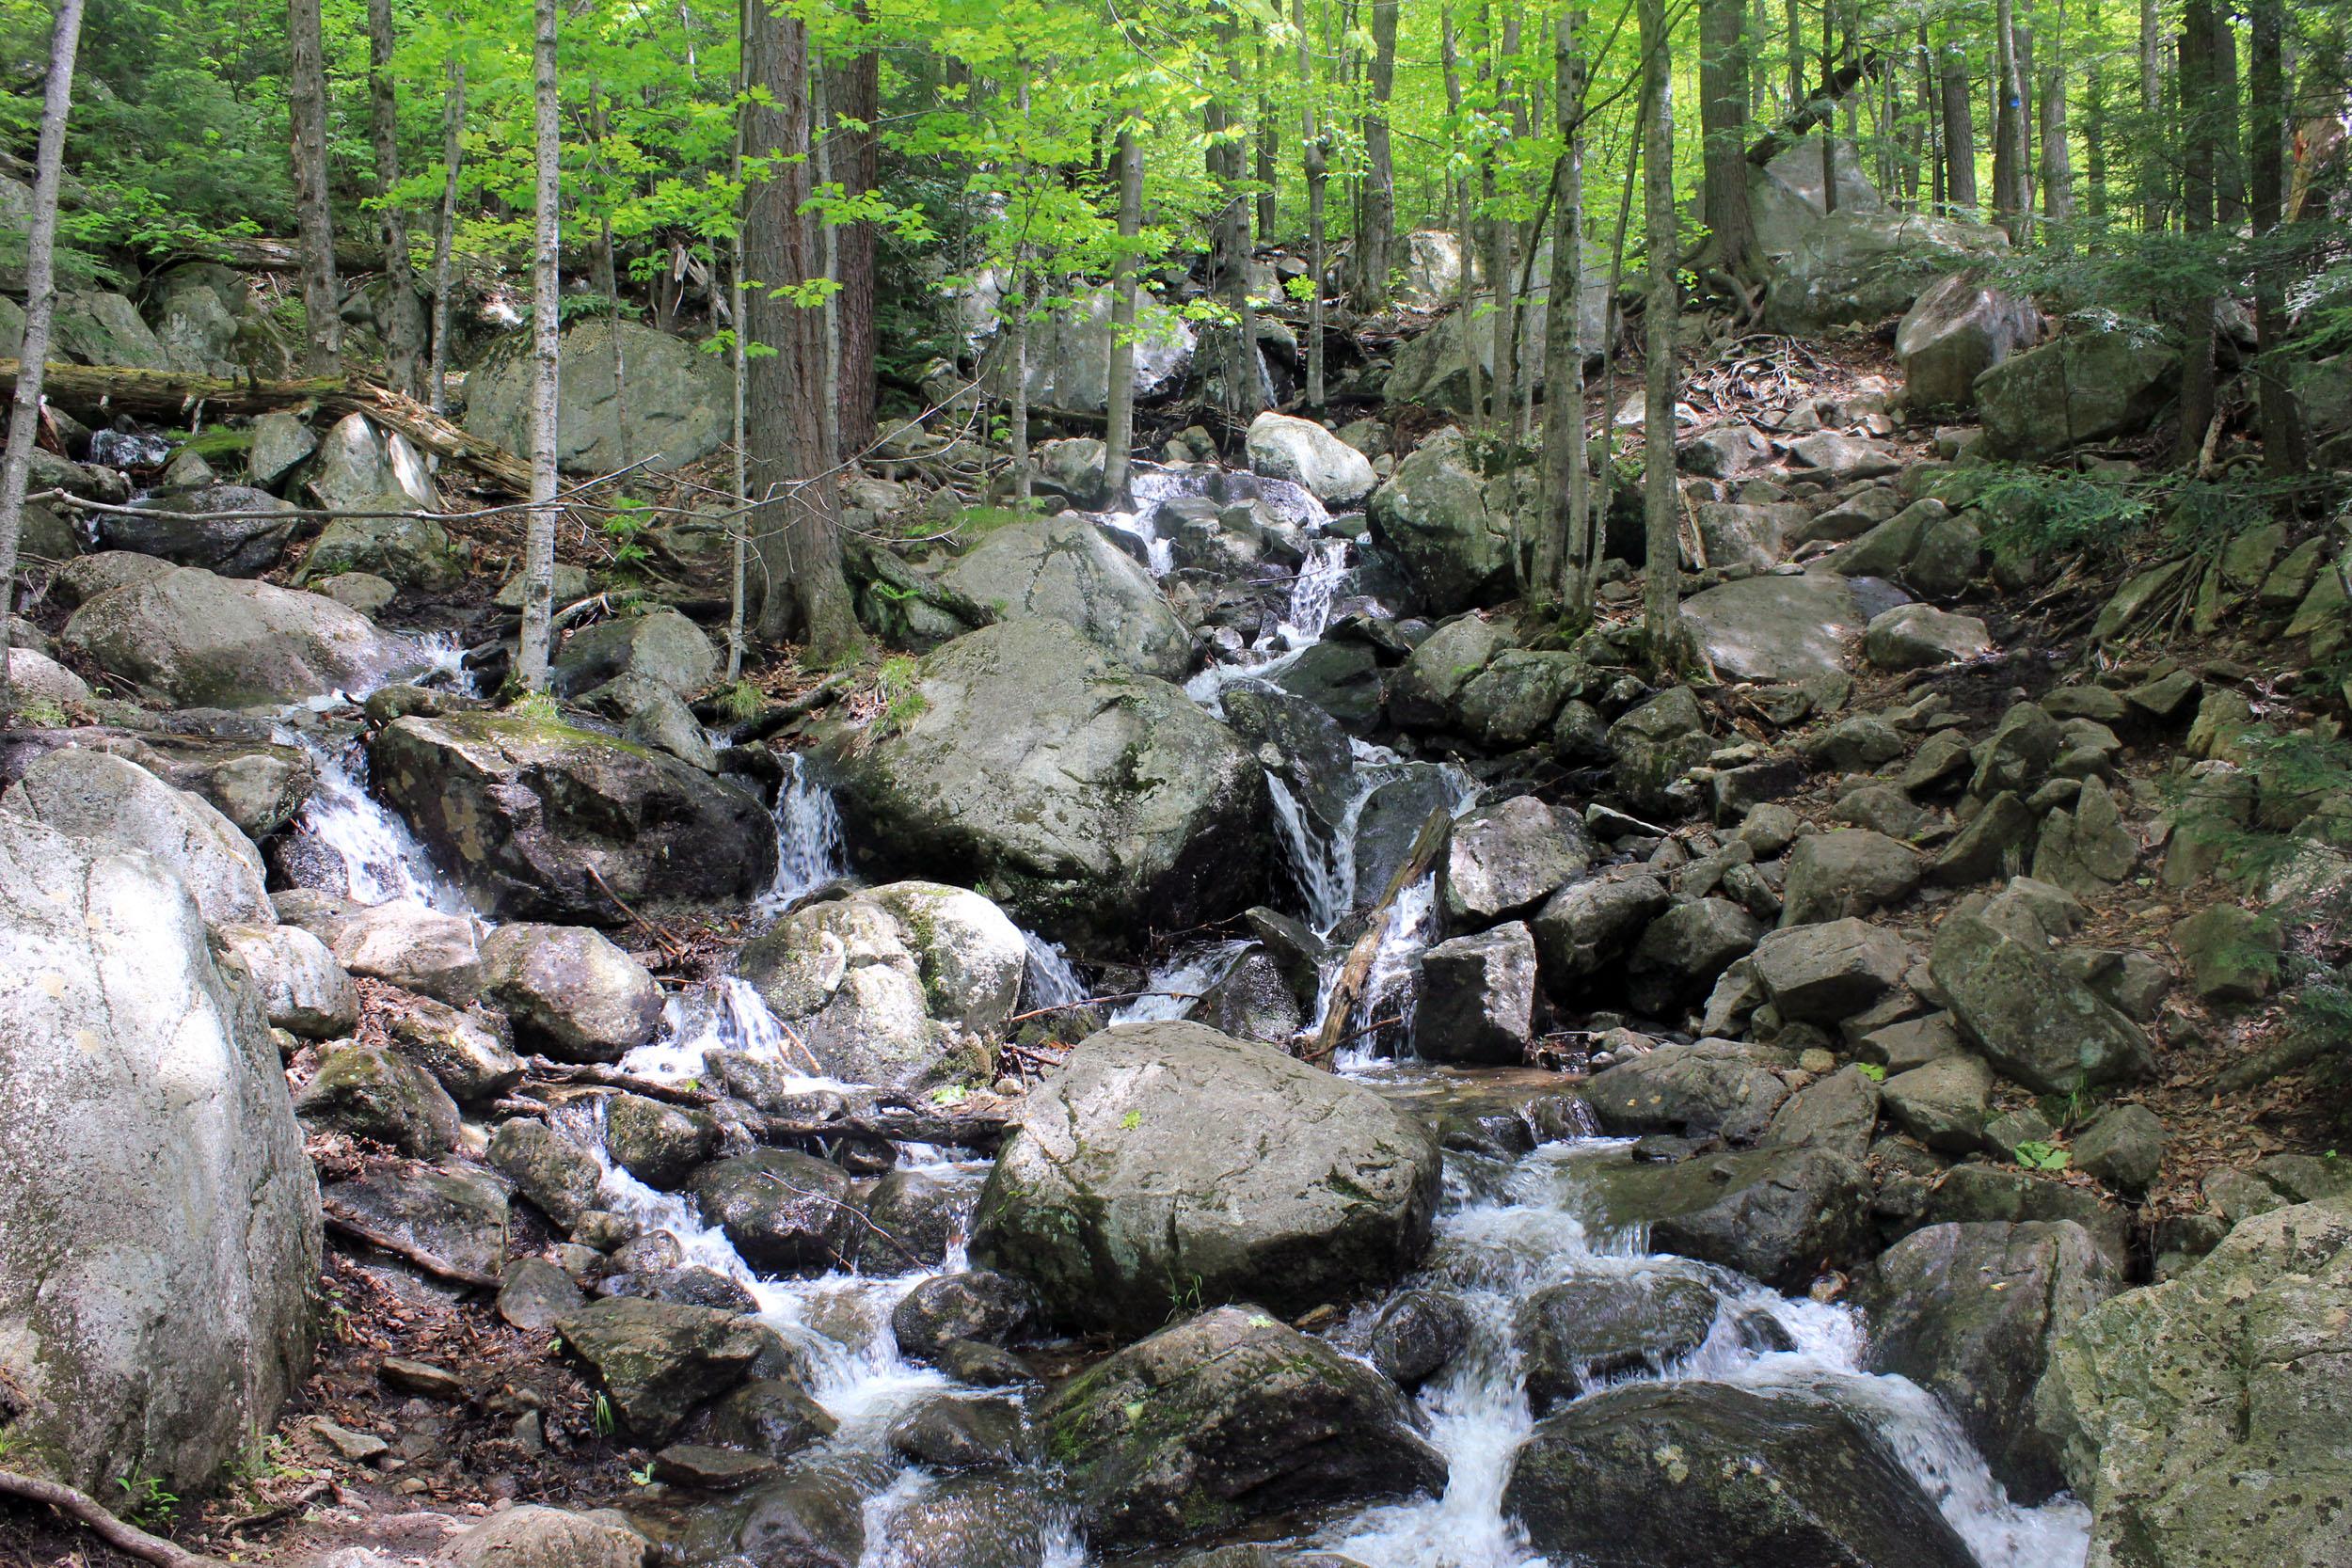 Frozen Waterfall, Adirondack Mountains - New York